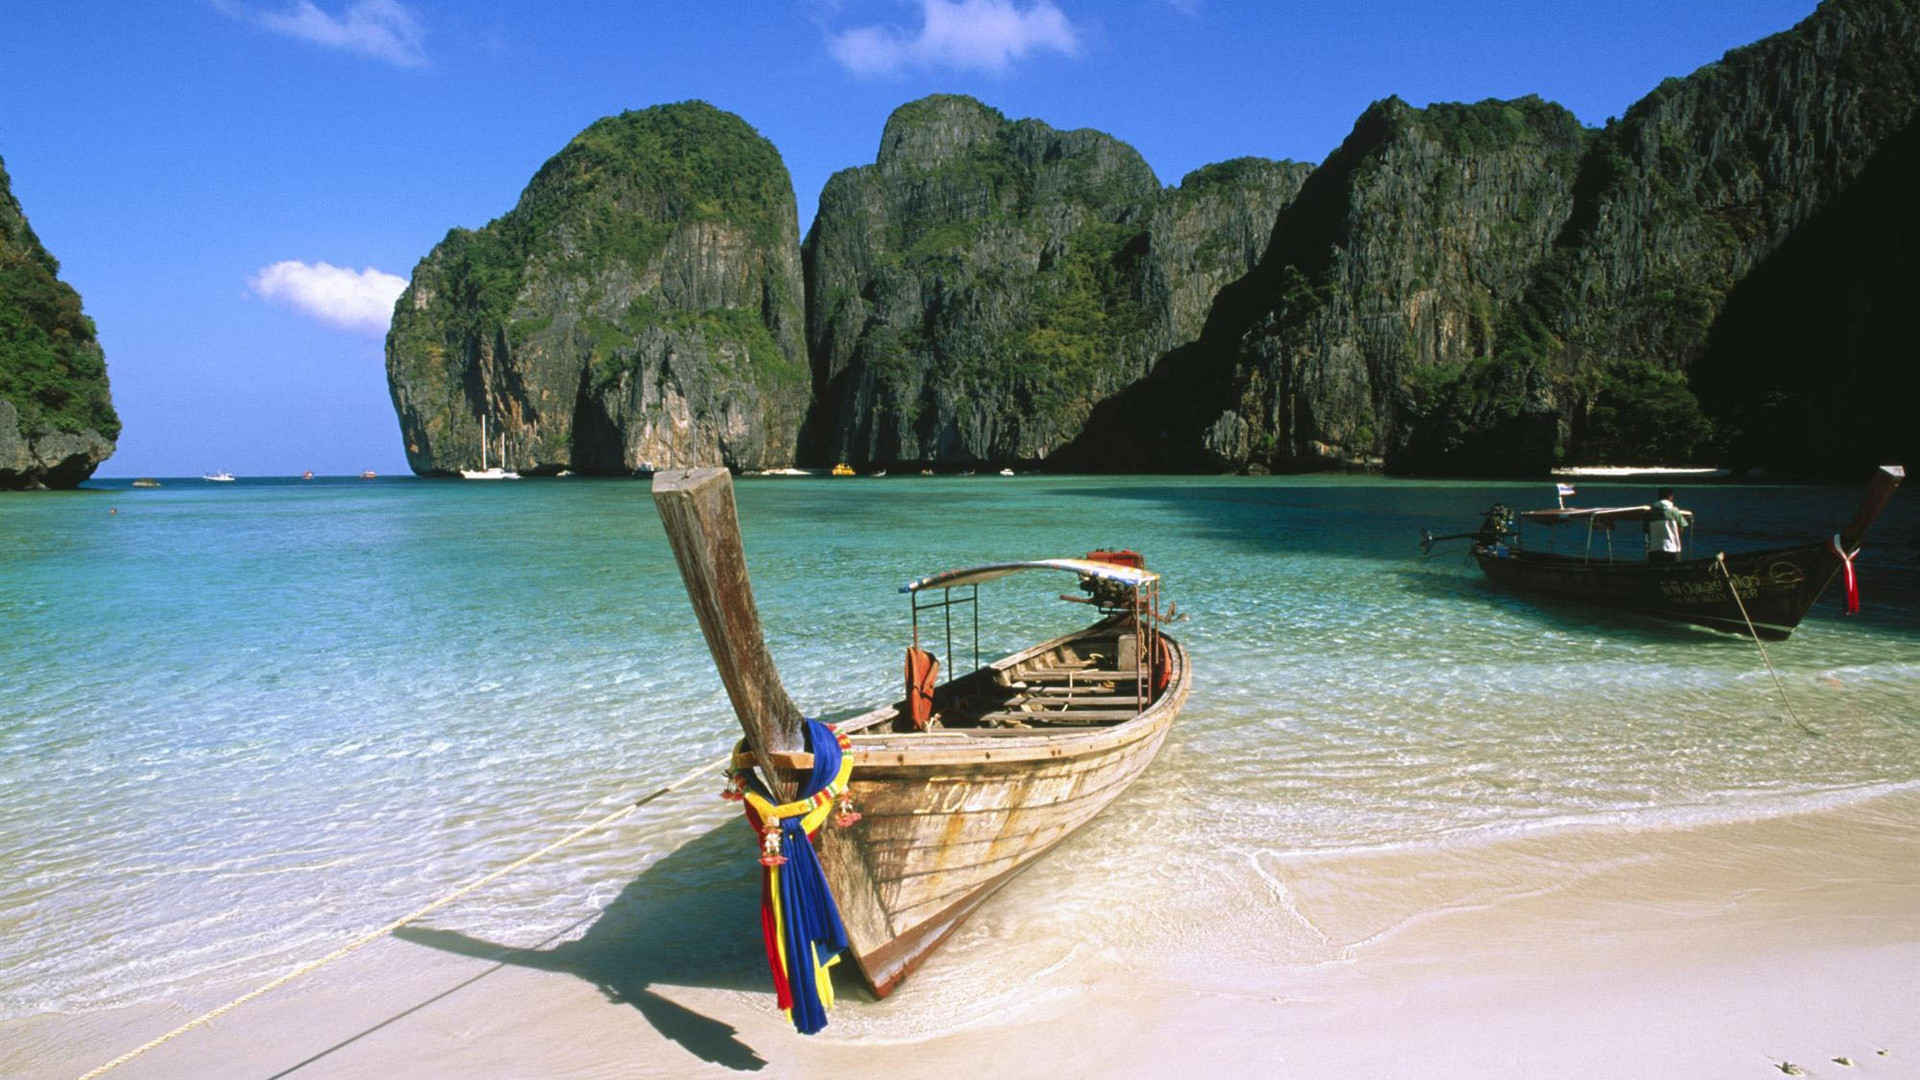 A Boat On The Beach In Summer Backgrounds Hd Desktop - Phi Phi Islands - HD Wallpaper